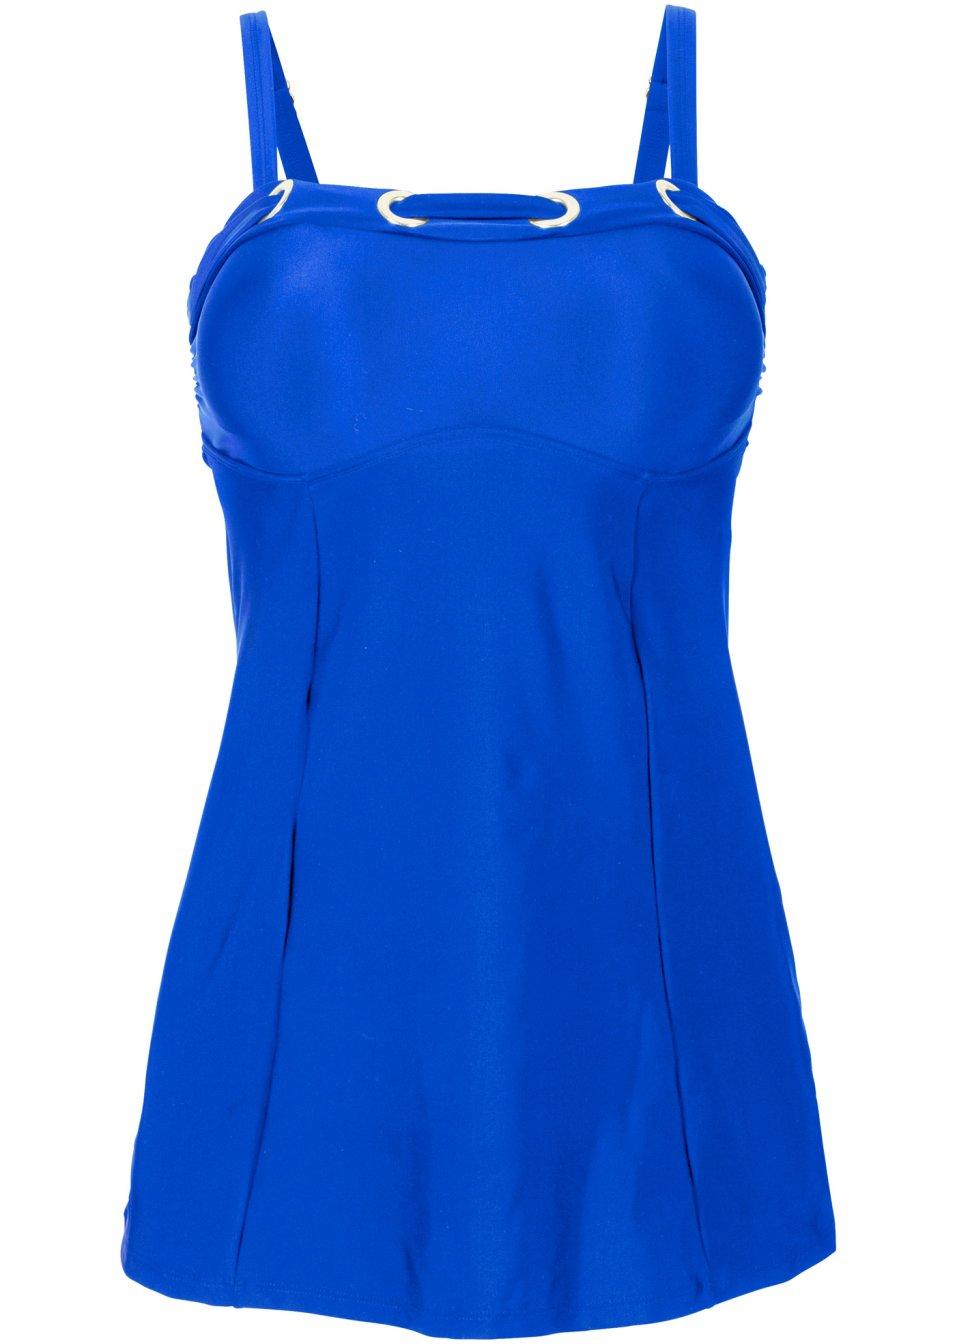 attraktiver tankini in langer schnittform blau. Black Bedroom Furniture Sets. Home Design Ideas